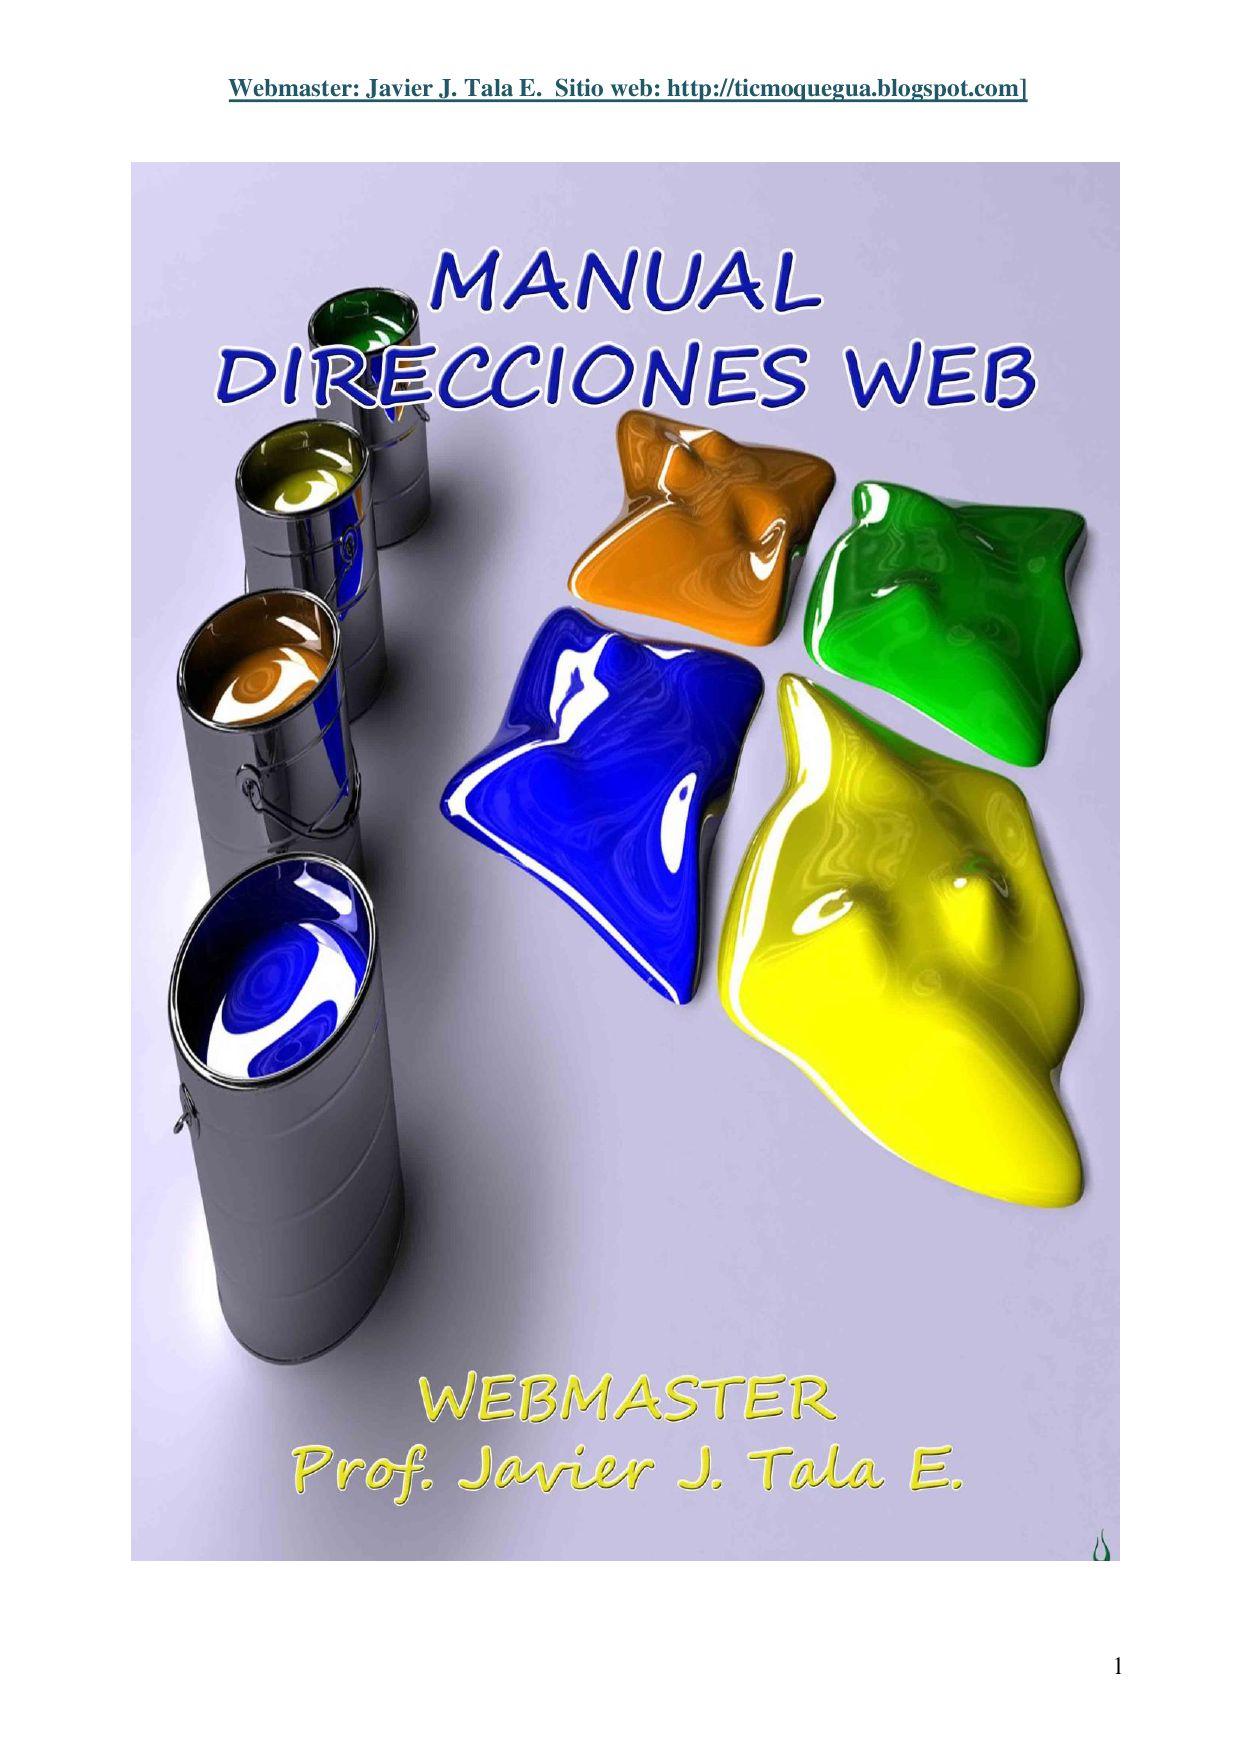 Manual direcciones web educativas by Javier Tala - issuu